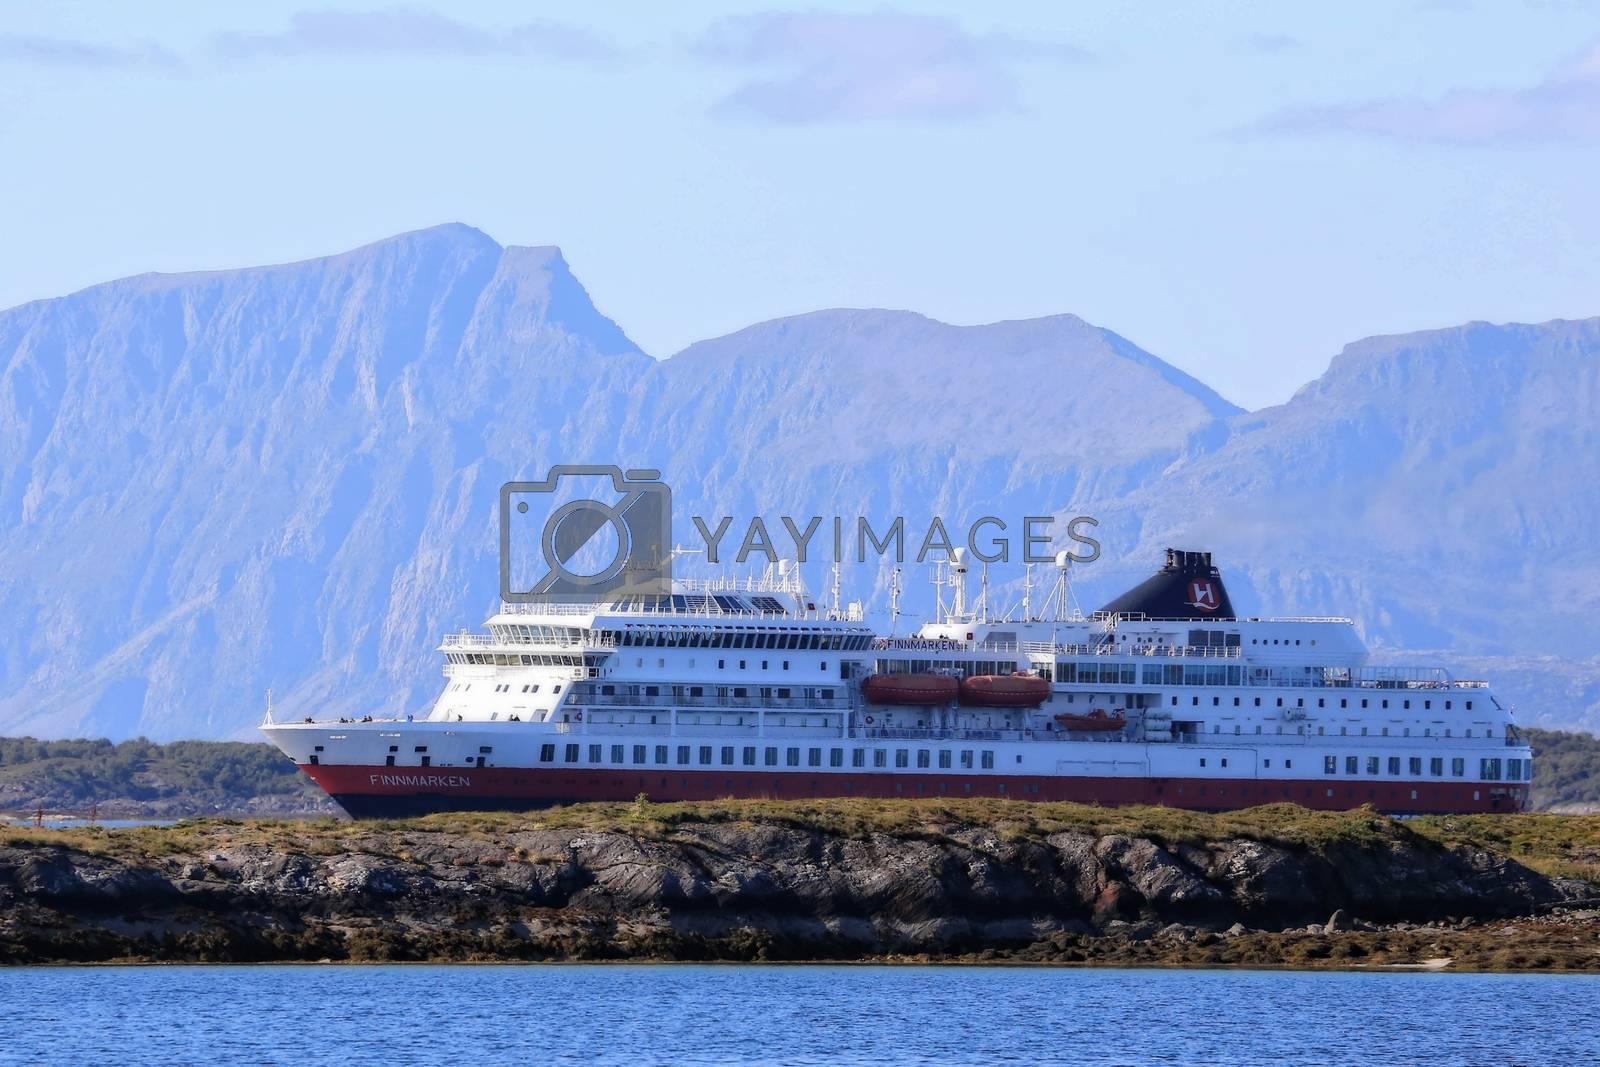 M.s Finnmarken ankommer Brønnøysund